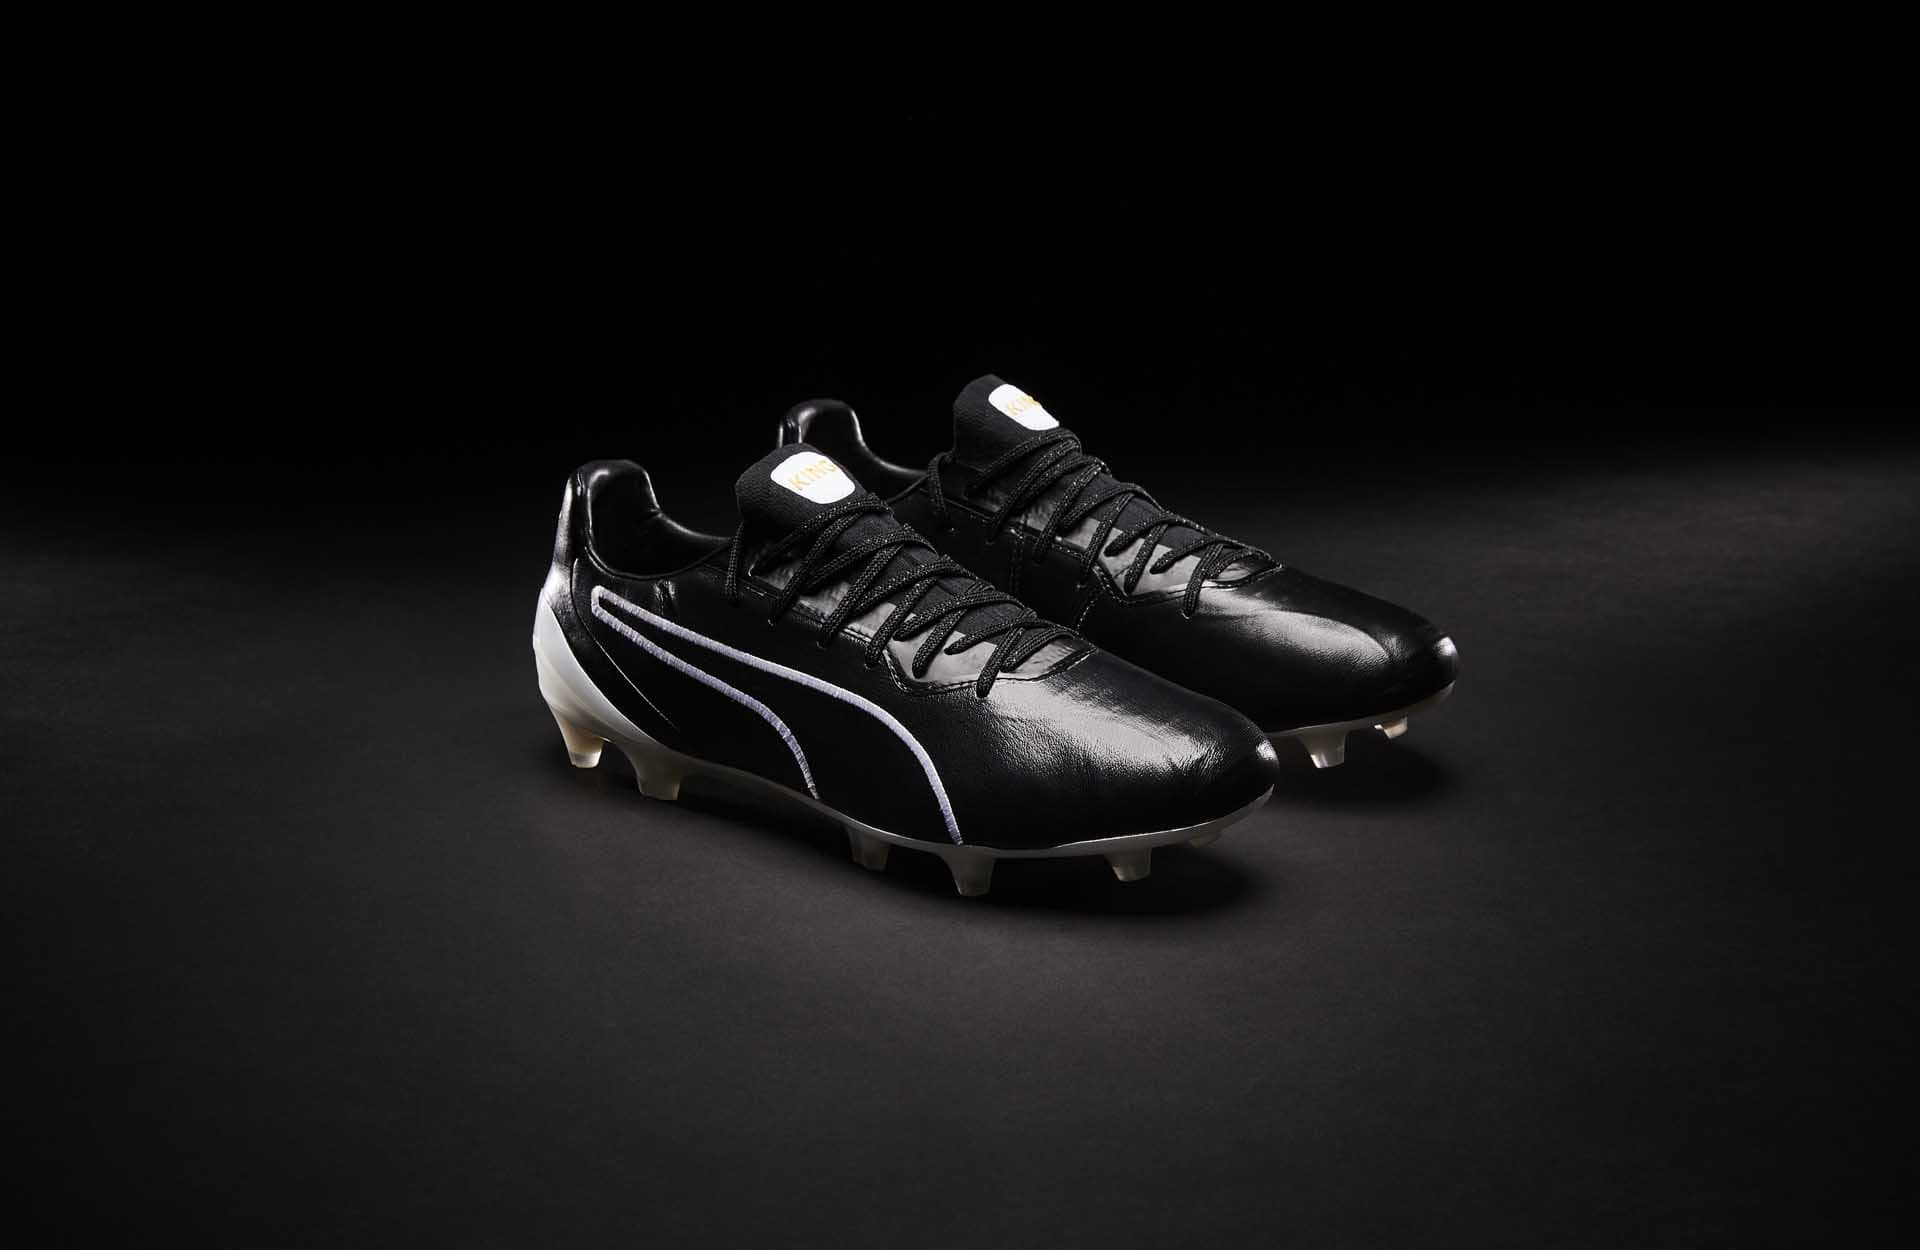 Puma lancerer Romelu Lukaku Limited Edition King Platinum støvle 2